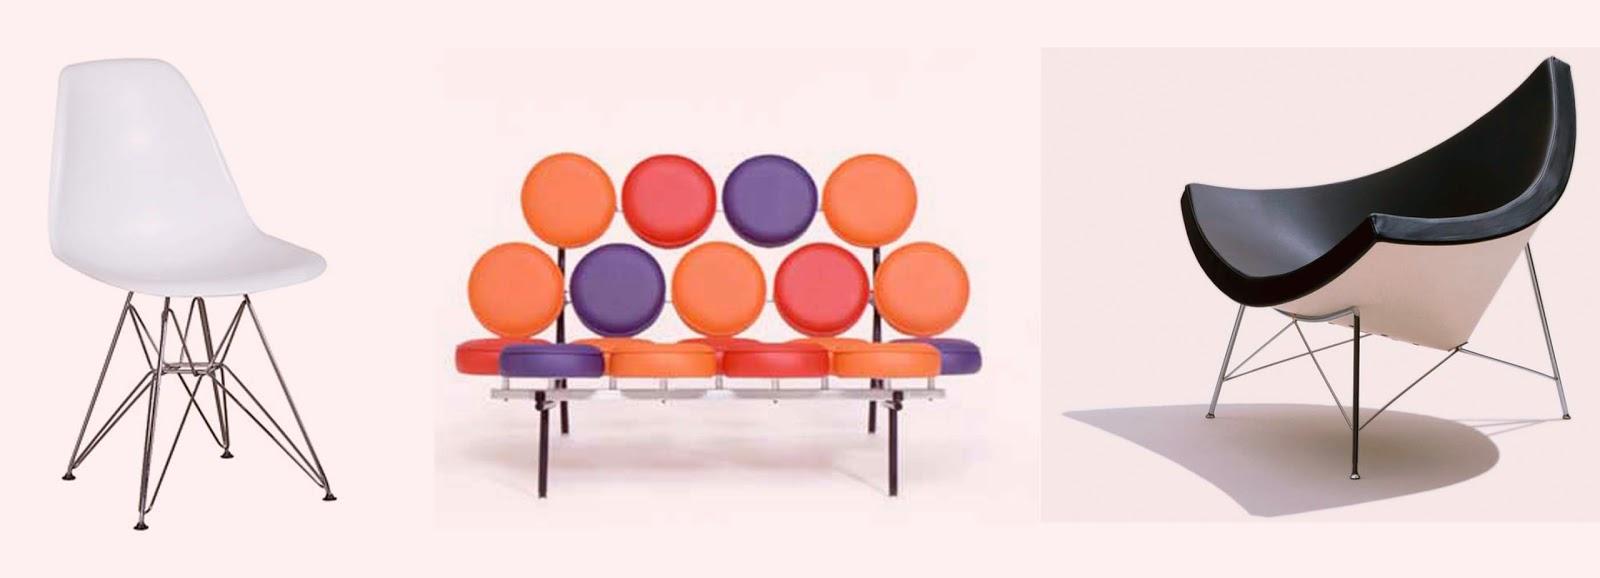 Descargar sillas de dise o 3d en autocad 3d max o for Sillas de plastico de diseno